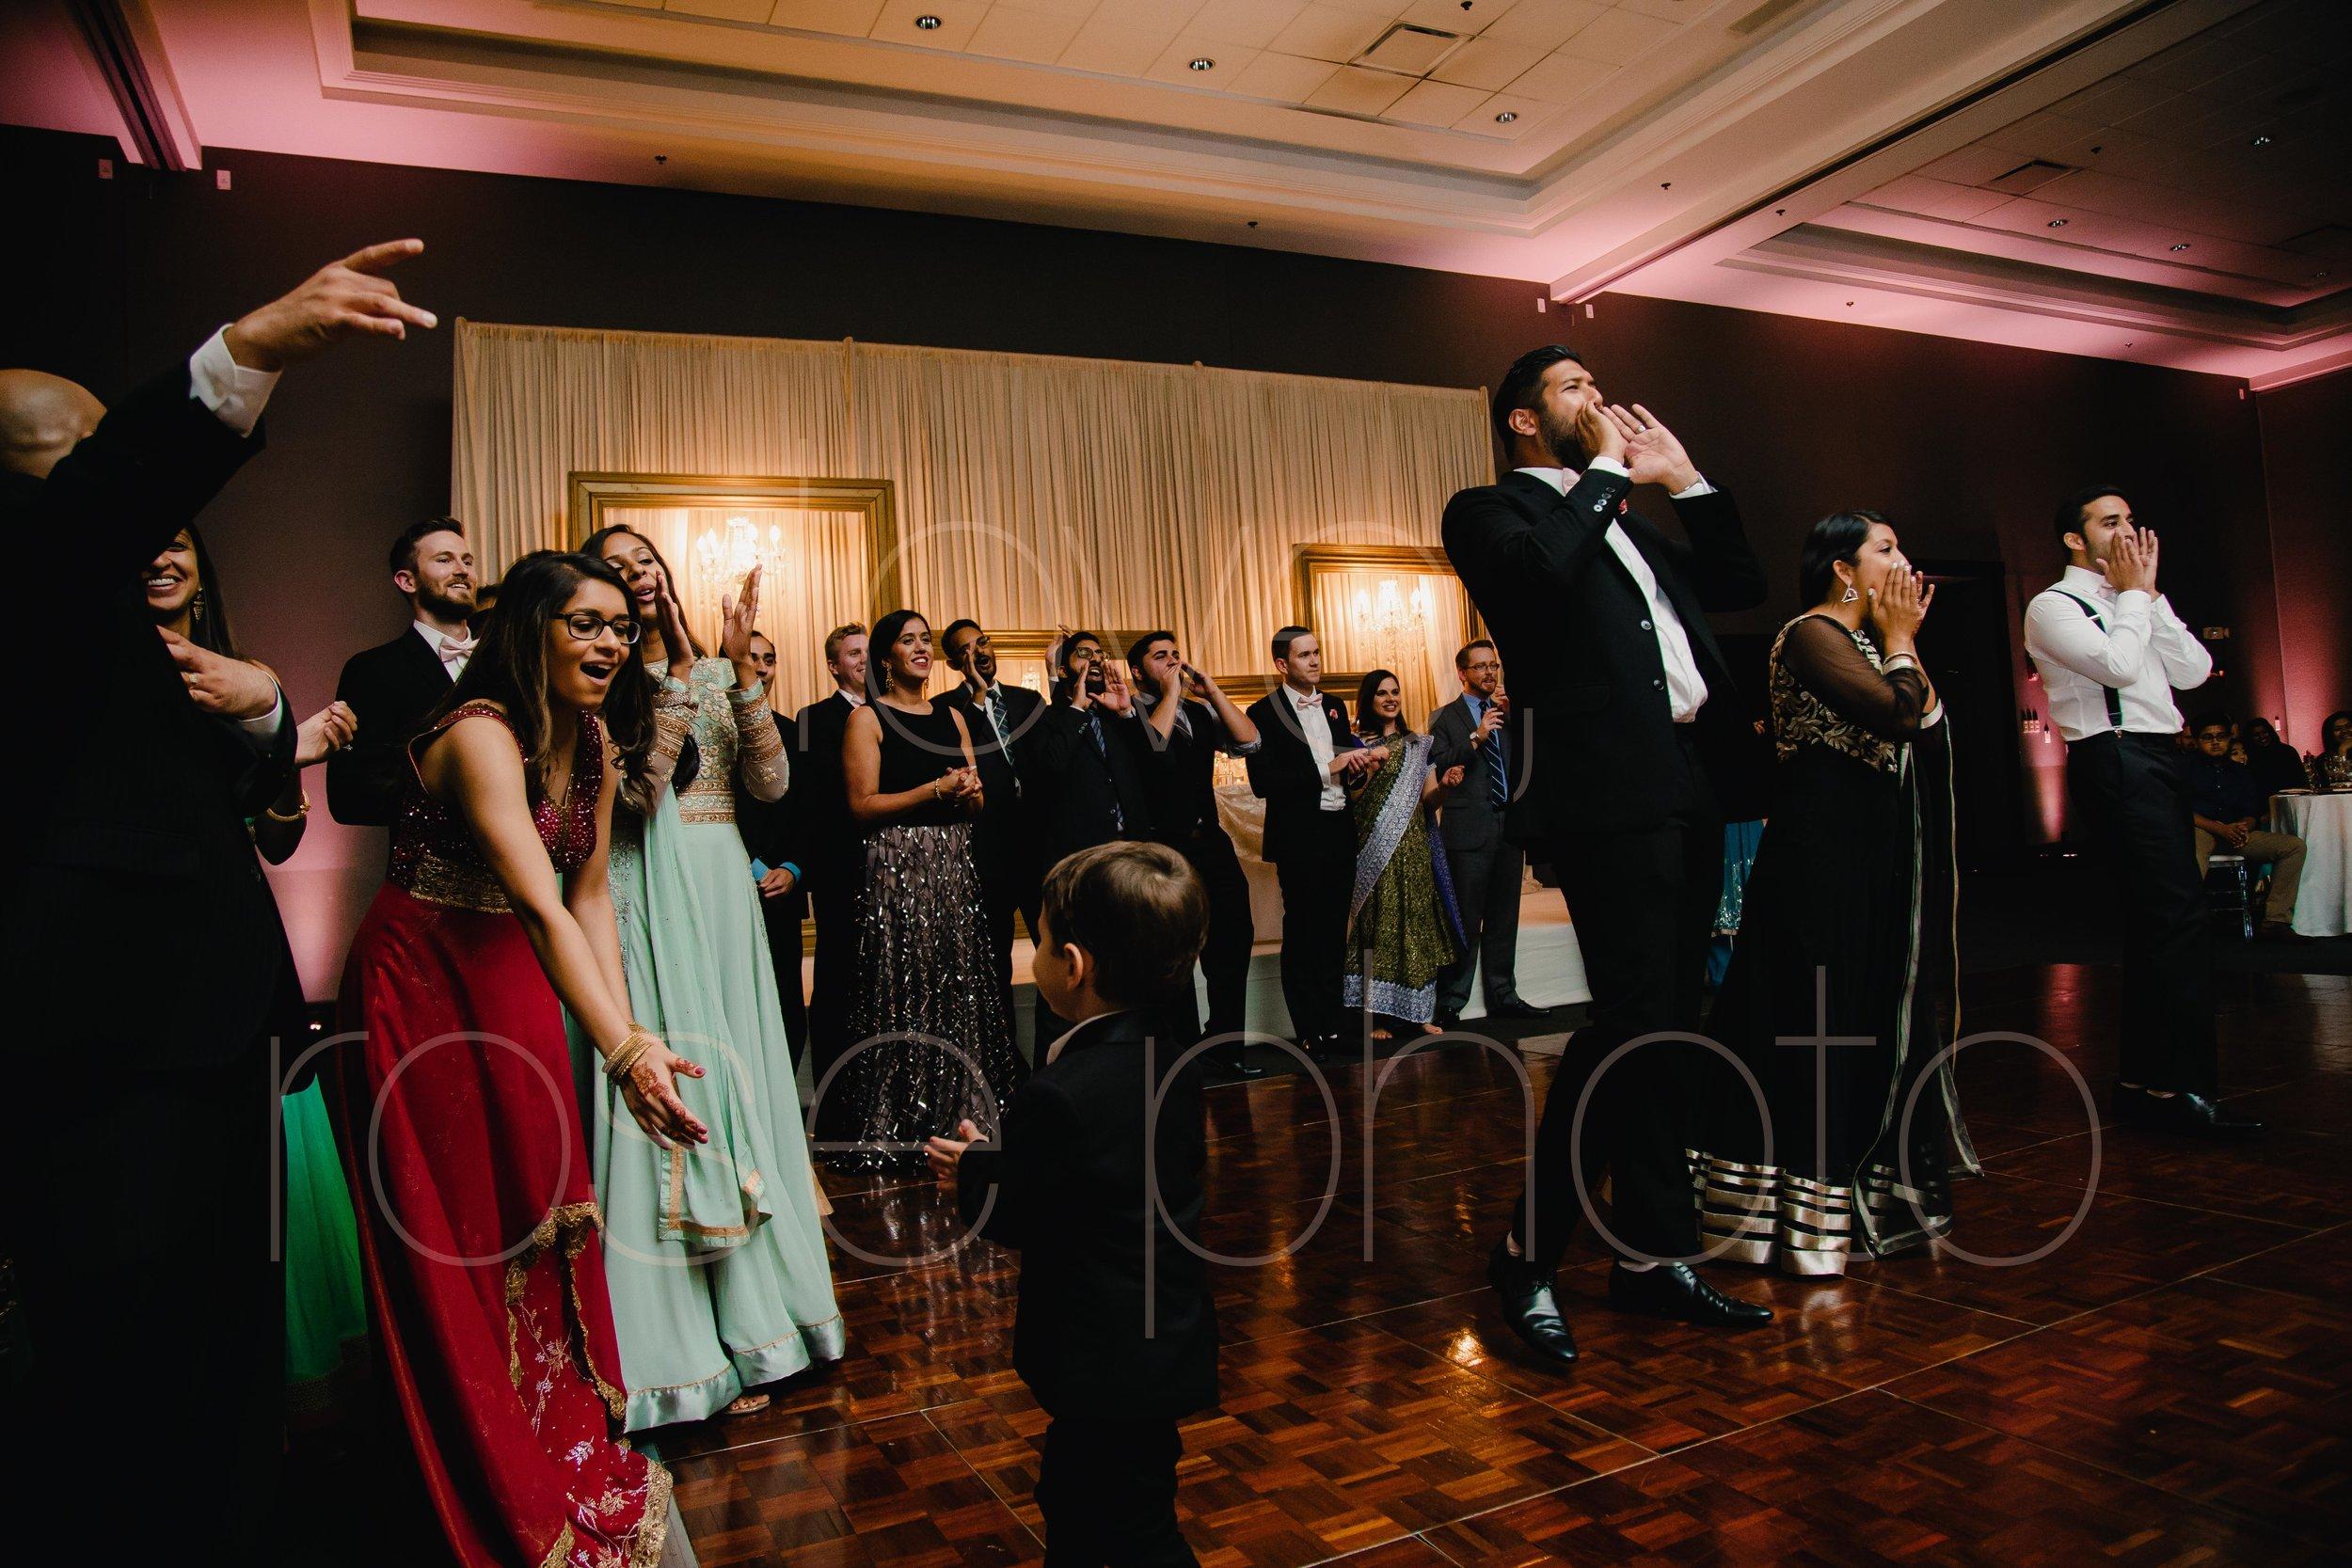 Chicago Indian Wedding best photography lifestyle wedding portrait luxury wedding-64.jpg